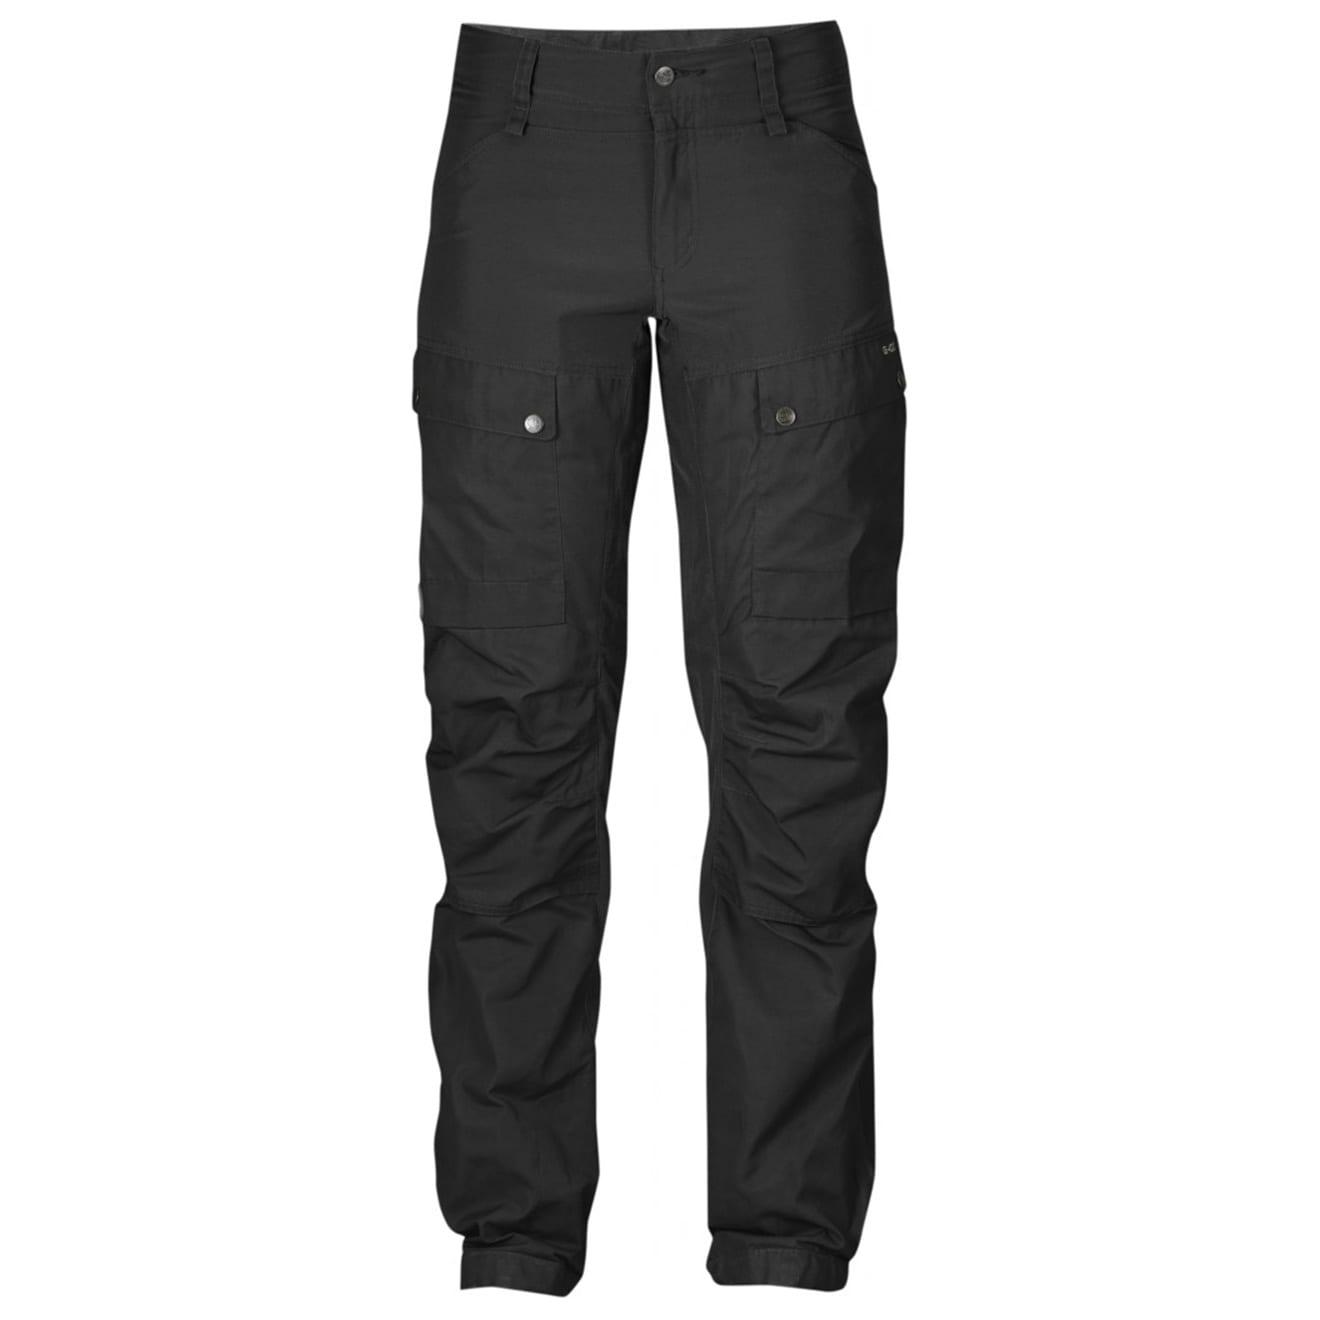 Fjallraven Womens Keb Trousers Regular Black / Black